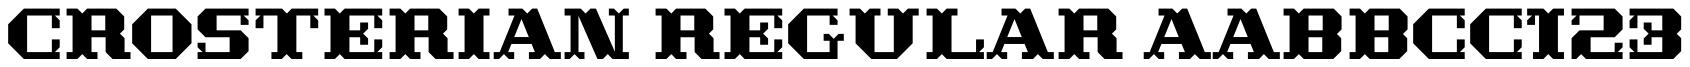 Crosterian